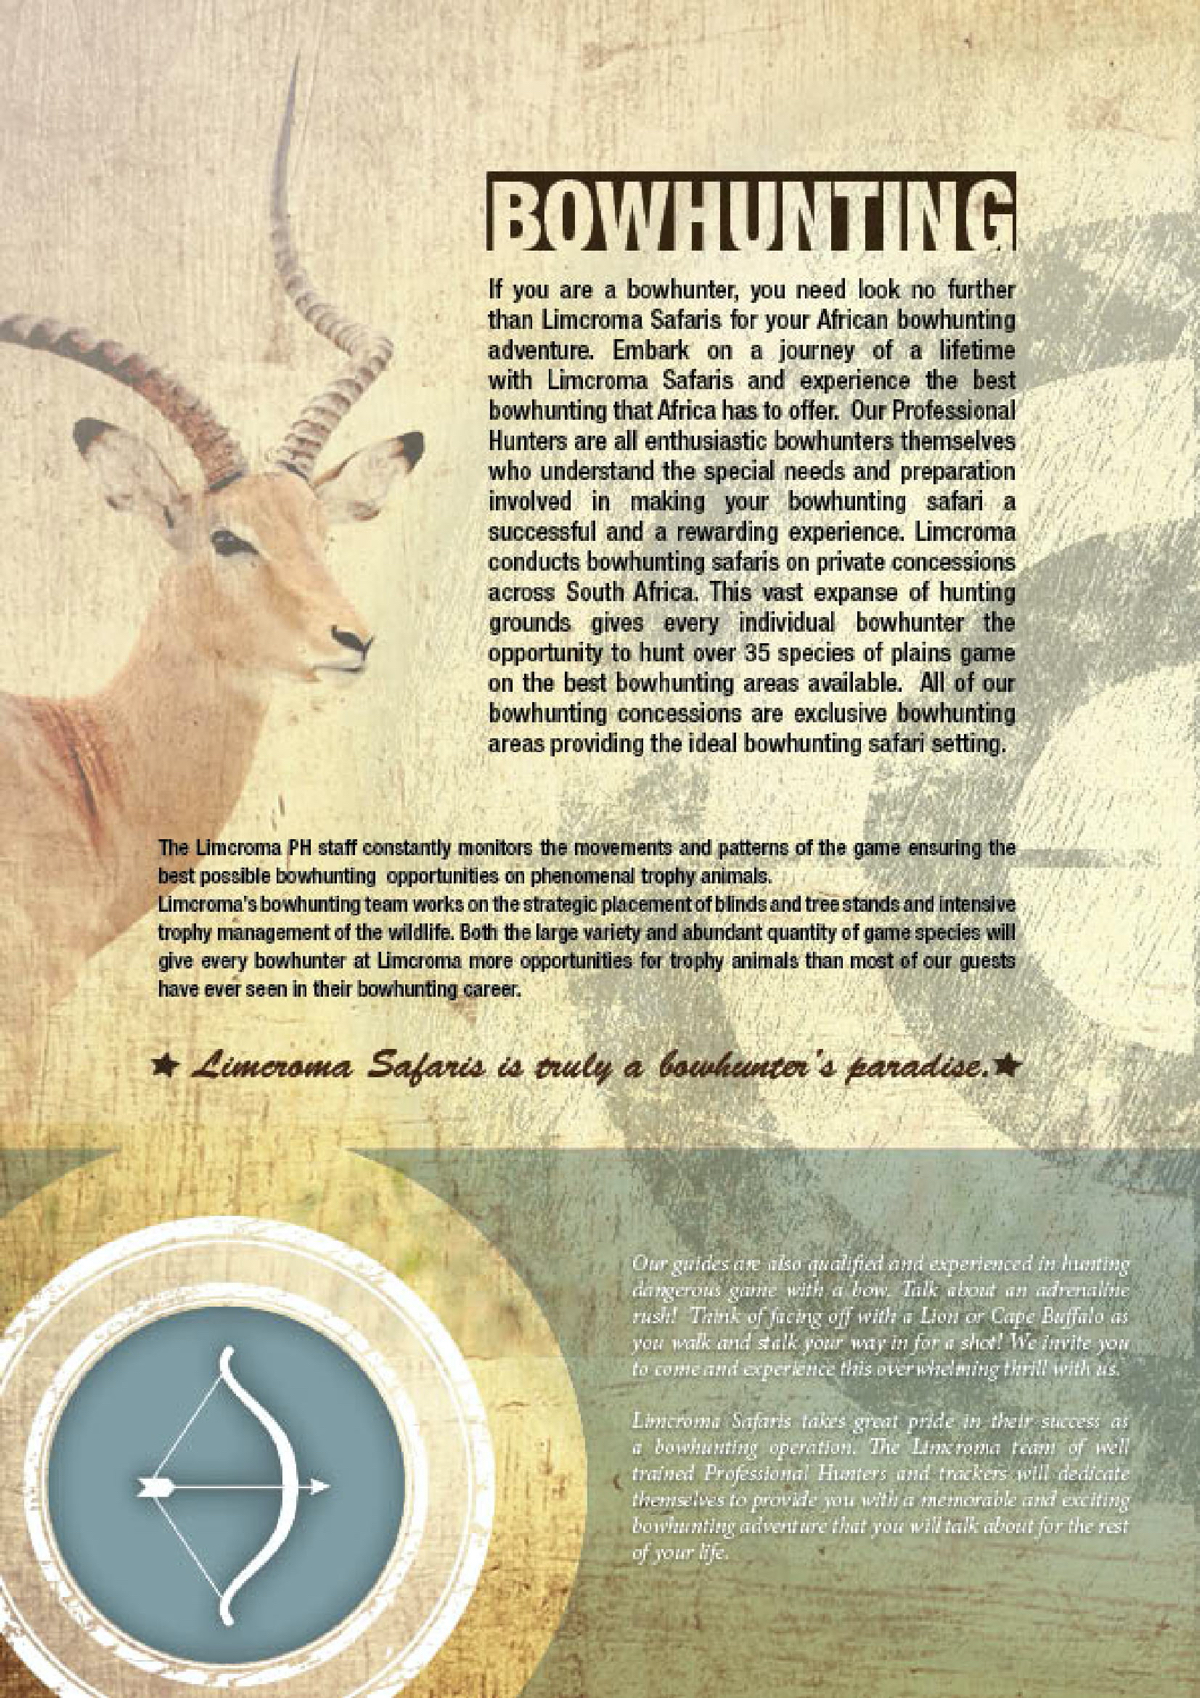 limcroma-safaris-04.jpg